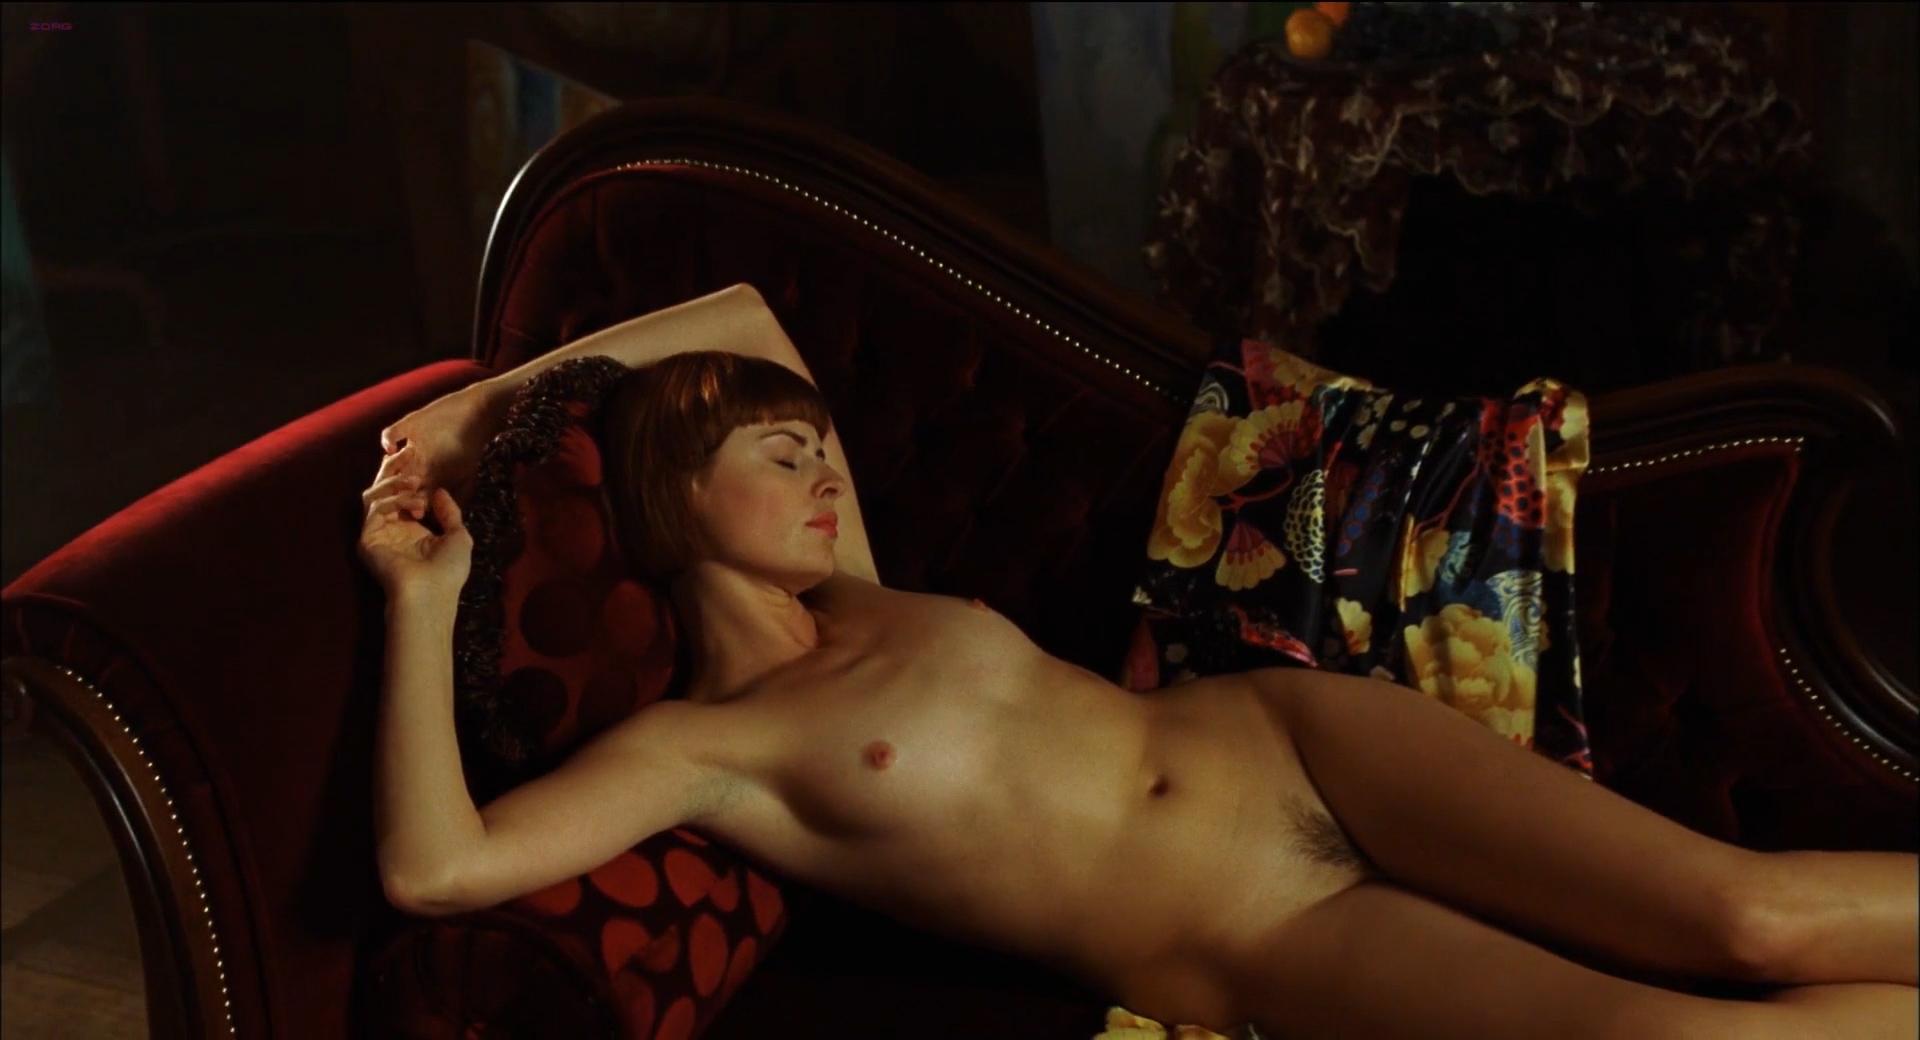 Erotic photo news